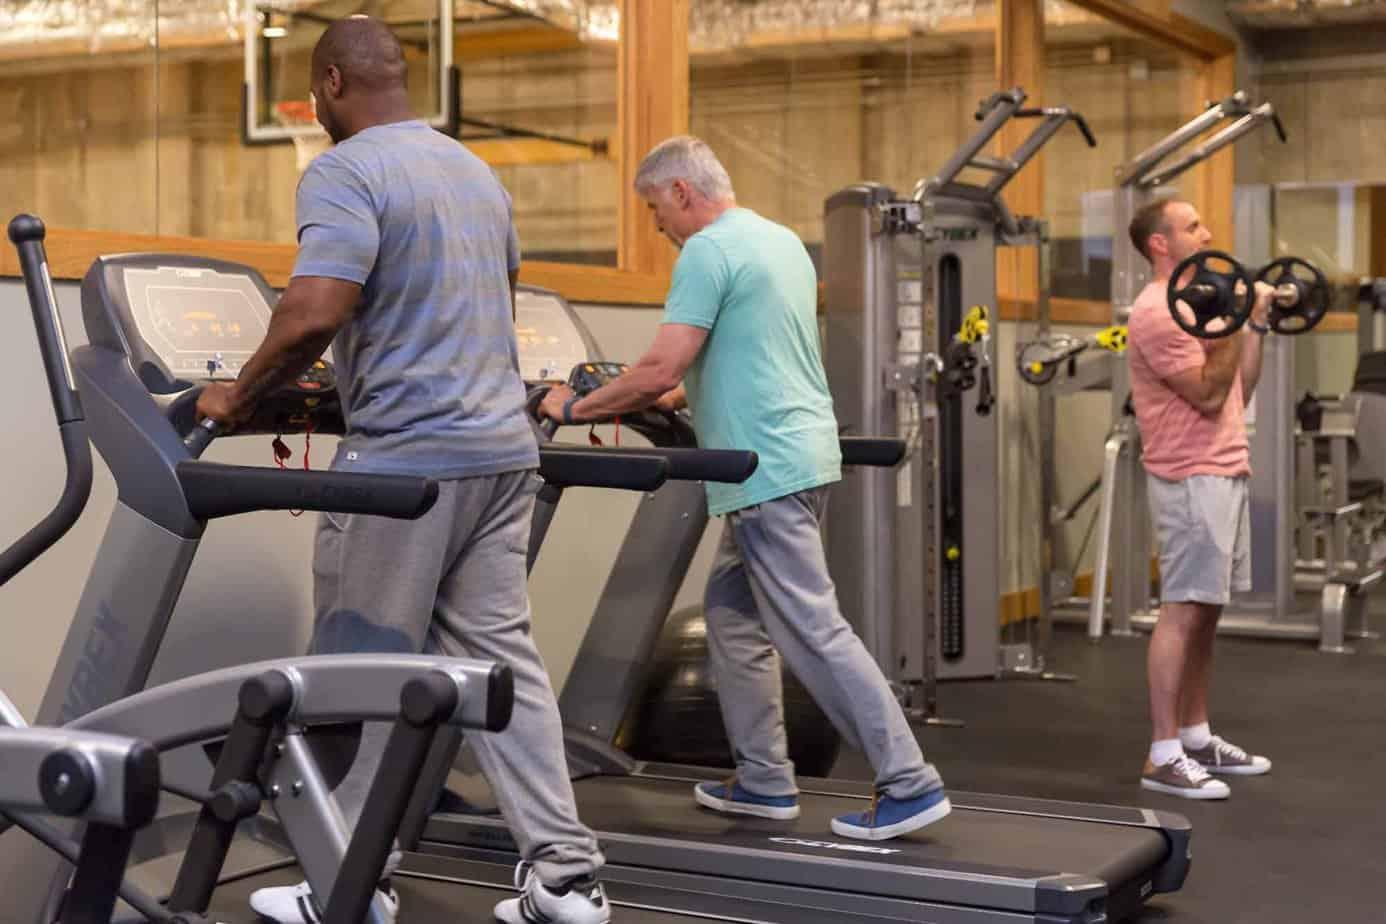 Men at Mountainside rehab's gym exercising to battle withdrawal symptoms.